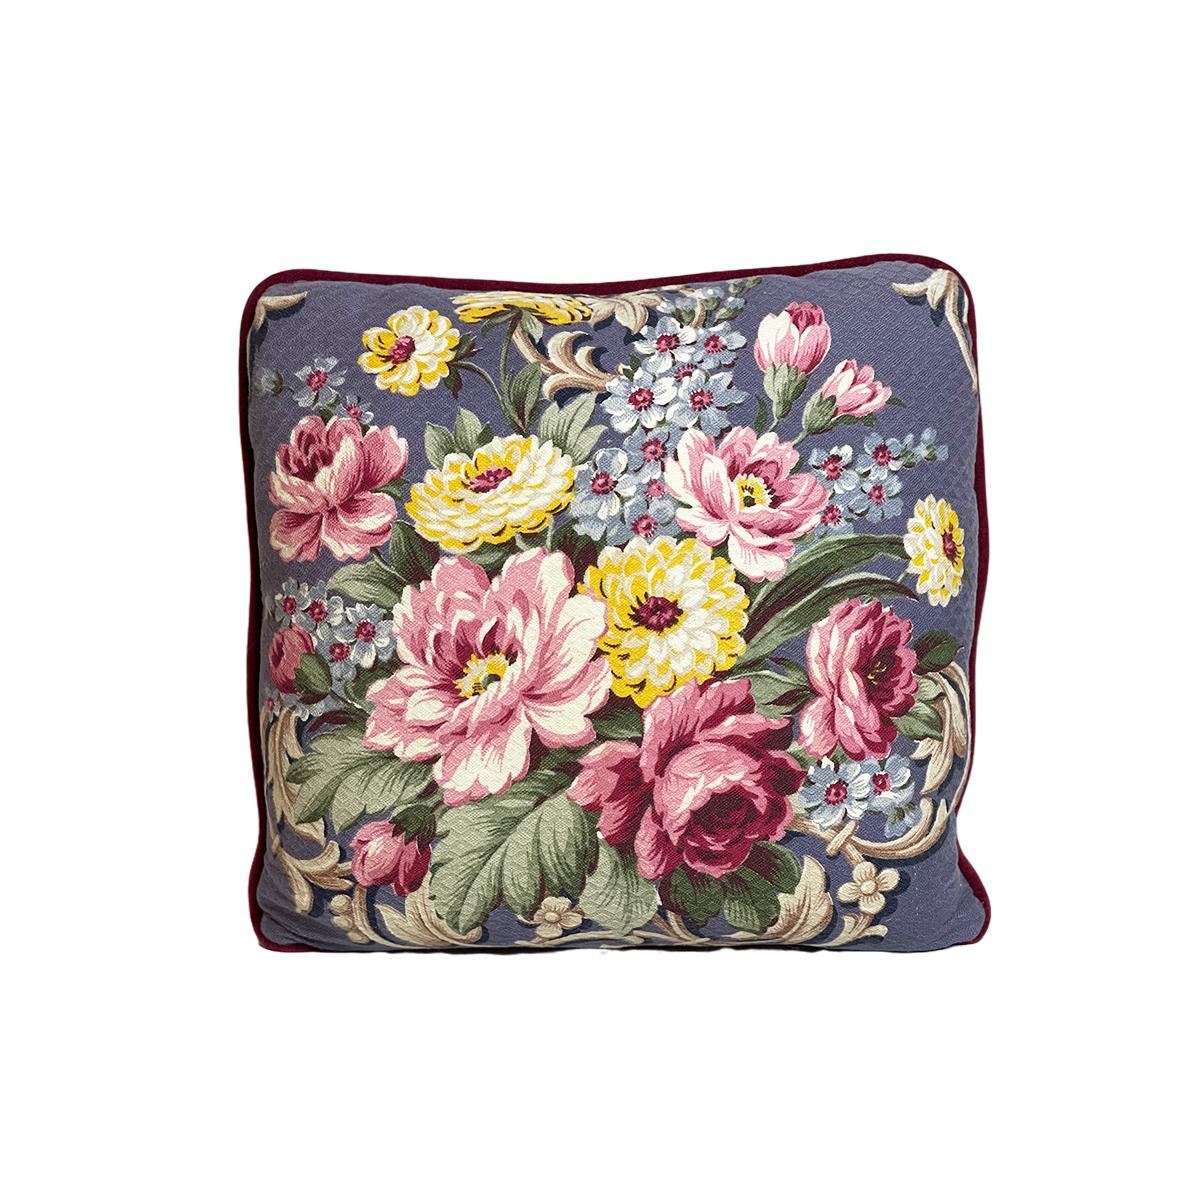 "Floral Motif on Lavender – Single Pillow, Pair available  – 18"" x 18"""